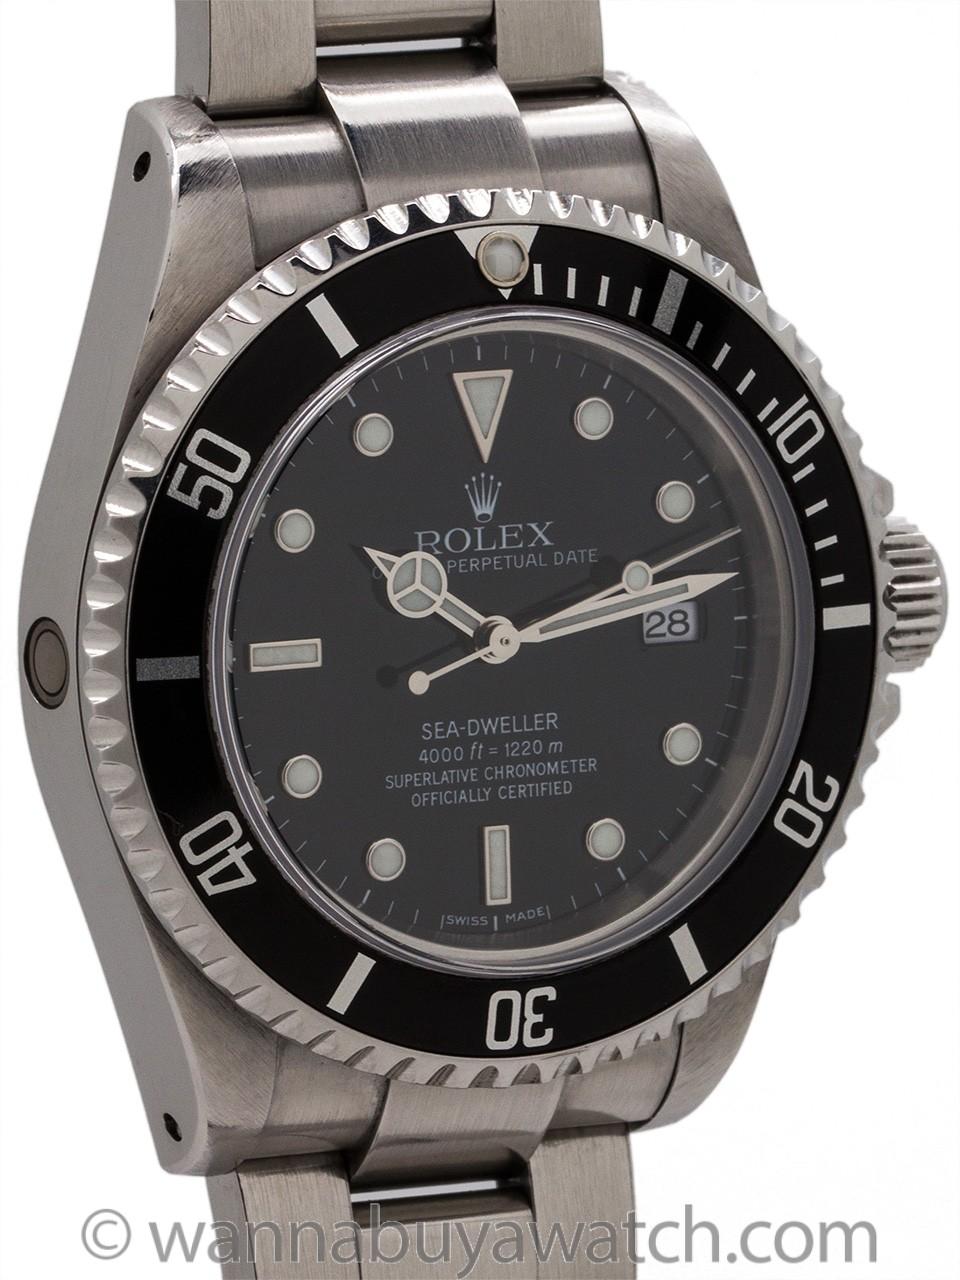 Rolex SeaDweller ref 16600 Stainless circa 2001 Full Set B & P